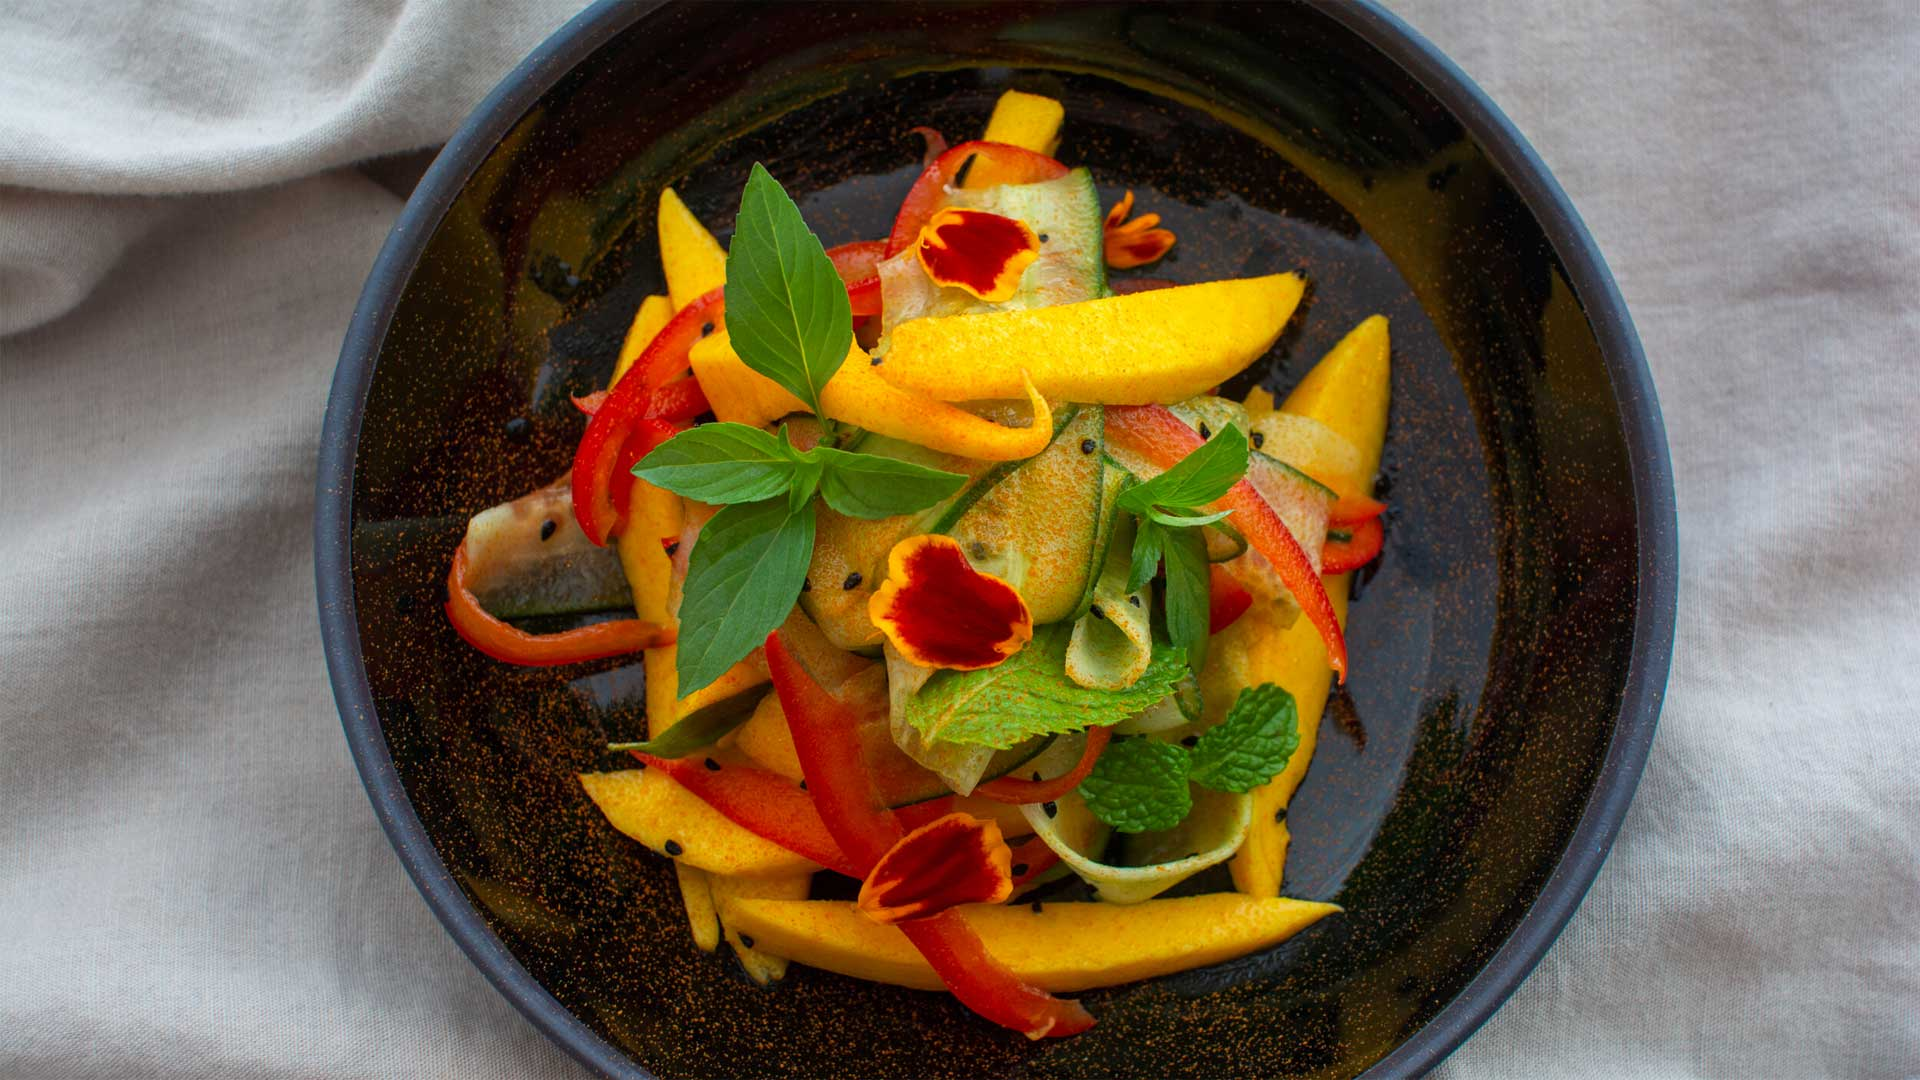 Sam Olayinka makes mango salad